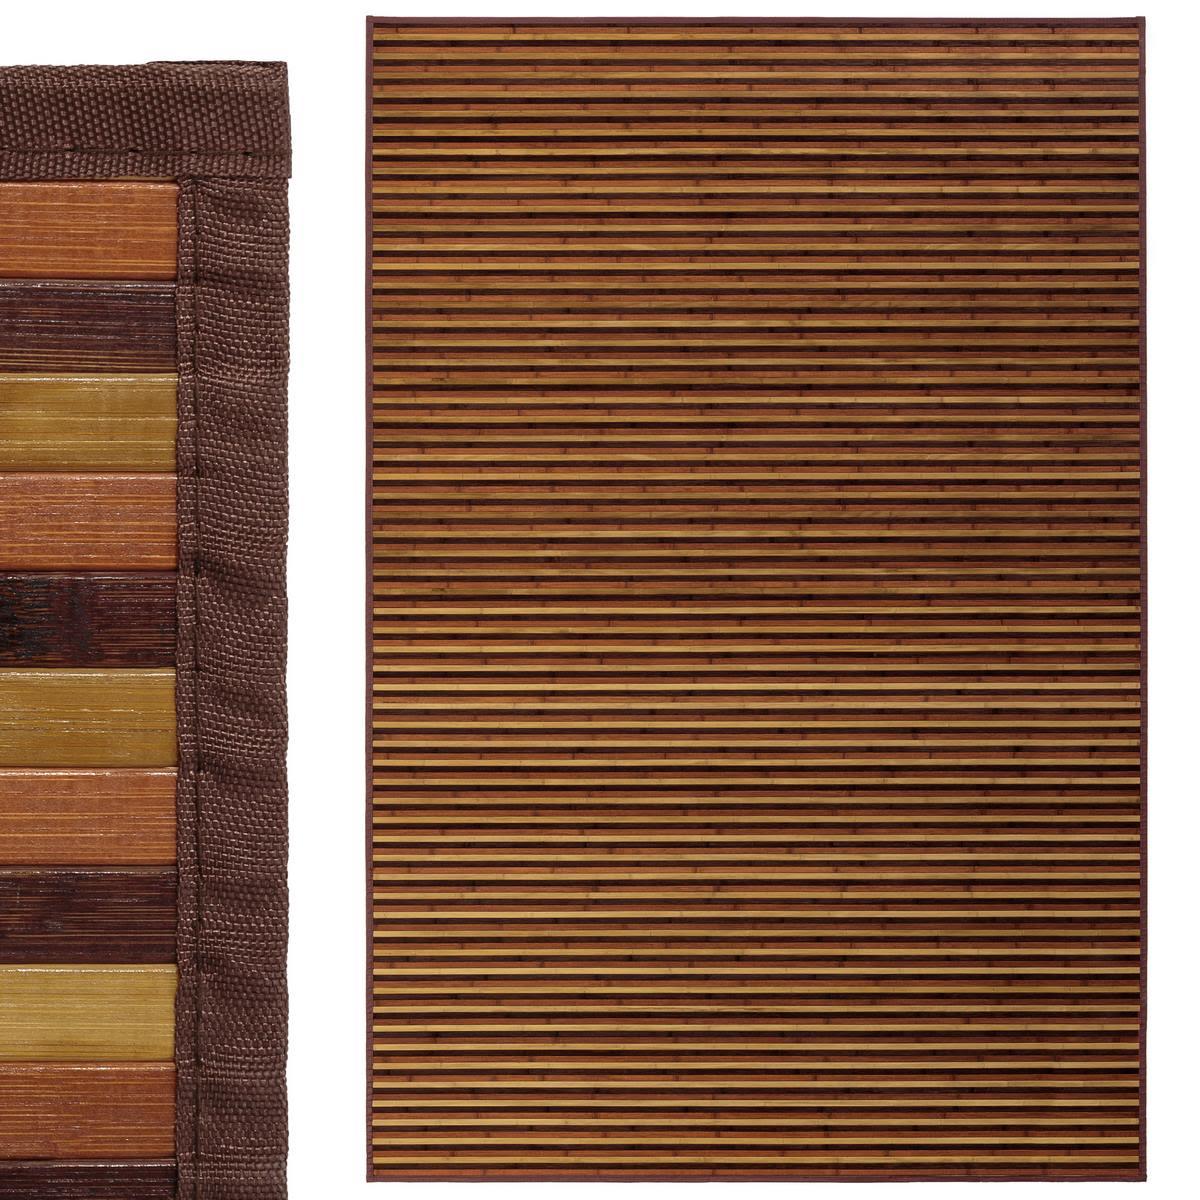 29857-alfombra-bambu-rayas-200-x-300.jpg